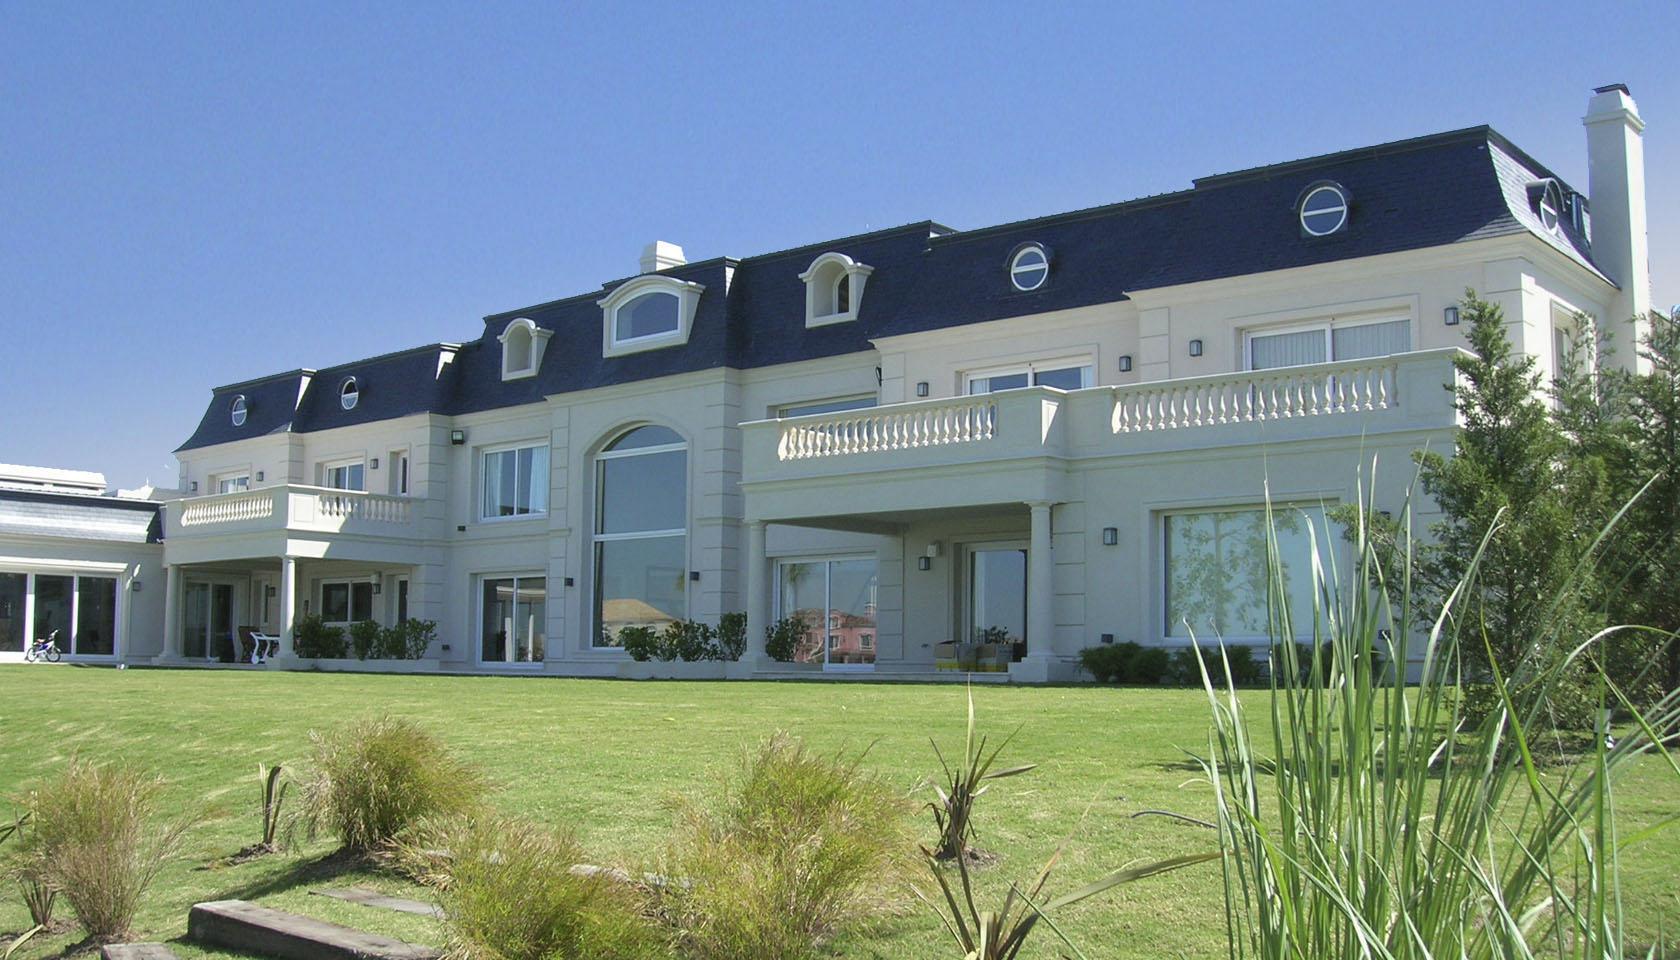 mansarda neoclásica, casa con ornamento, casas clásicas, arquitectura de lujo